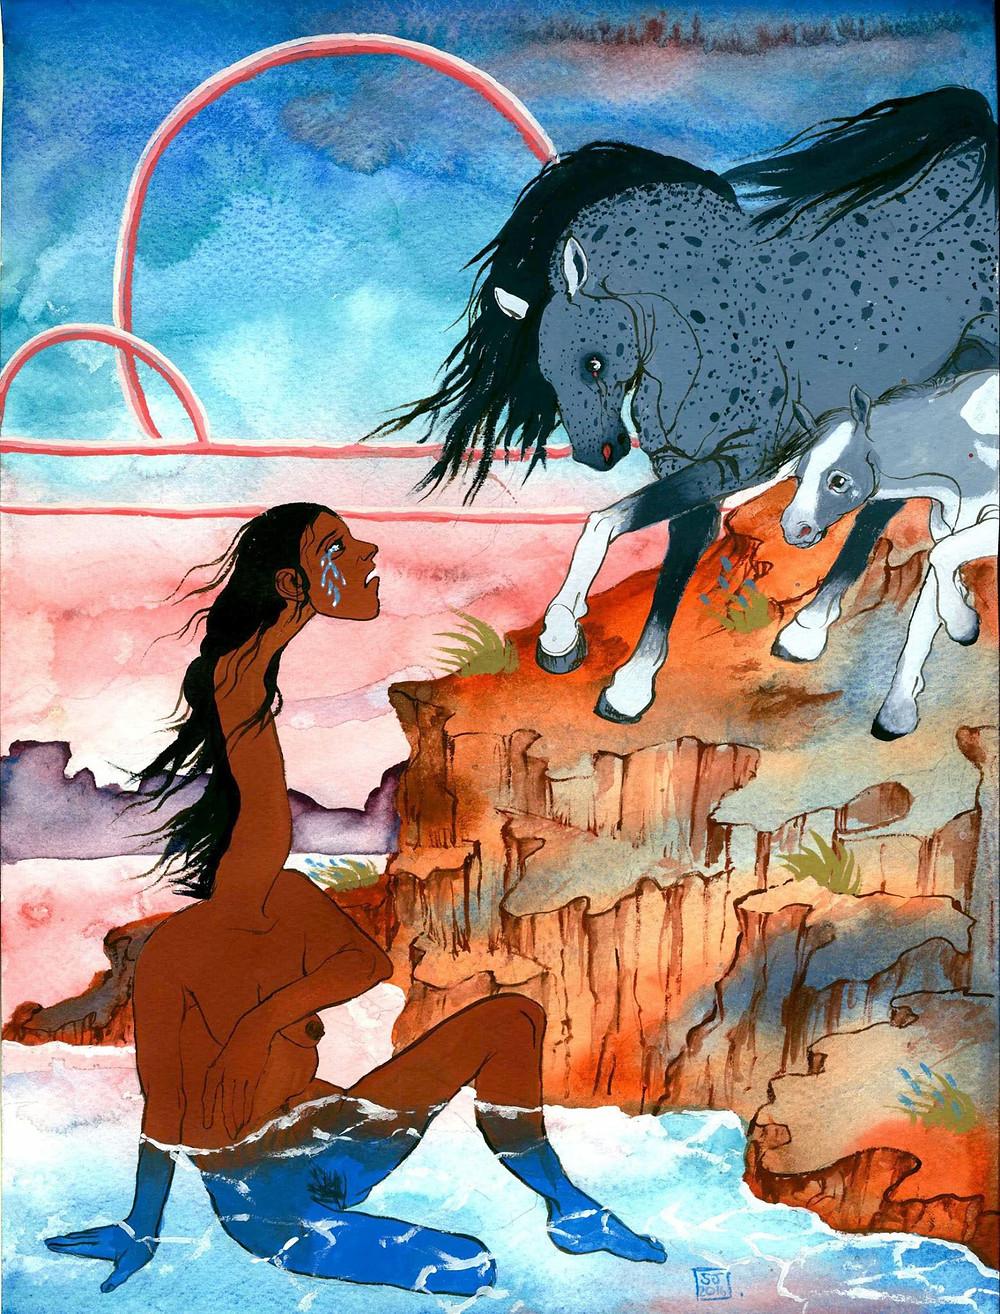 Sara Lorelei Jackson, Greenwich, Connecticut, manhattan, surreal, art, dark humor art, artist, woman, female, dark, cartoon, sex, urban, mythical, painting, illustration, interview, howl magazine, new york, nyc, horse